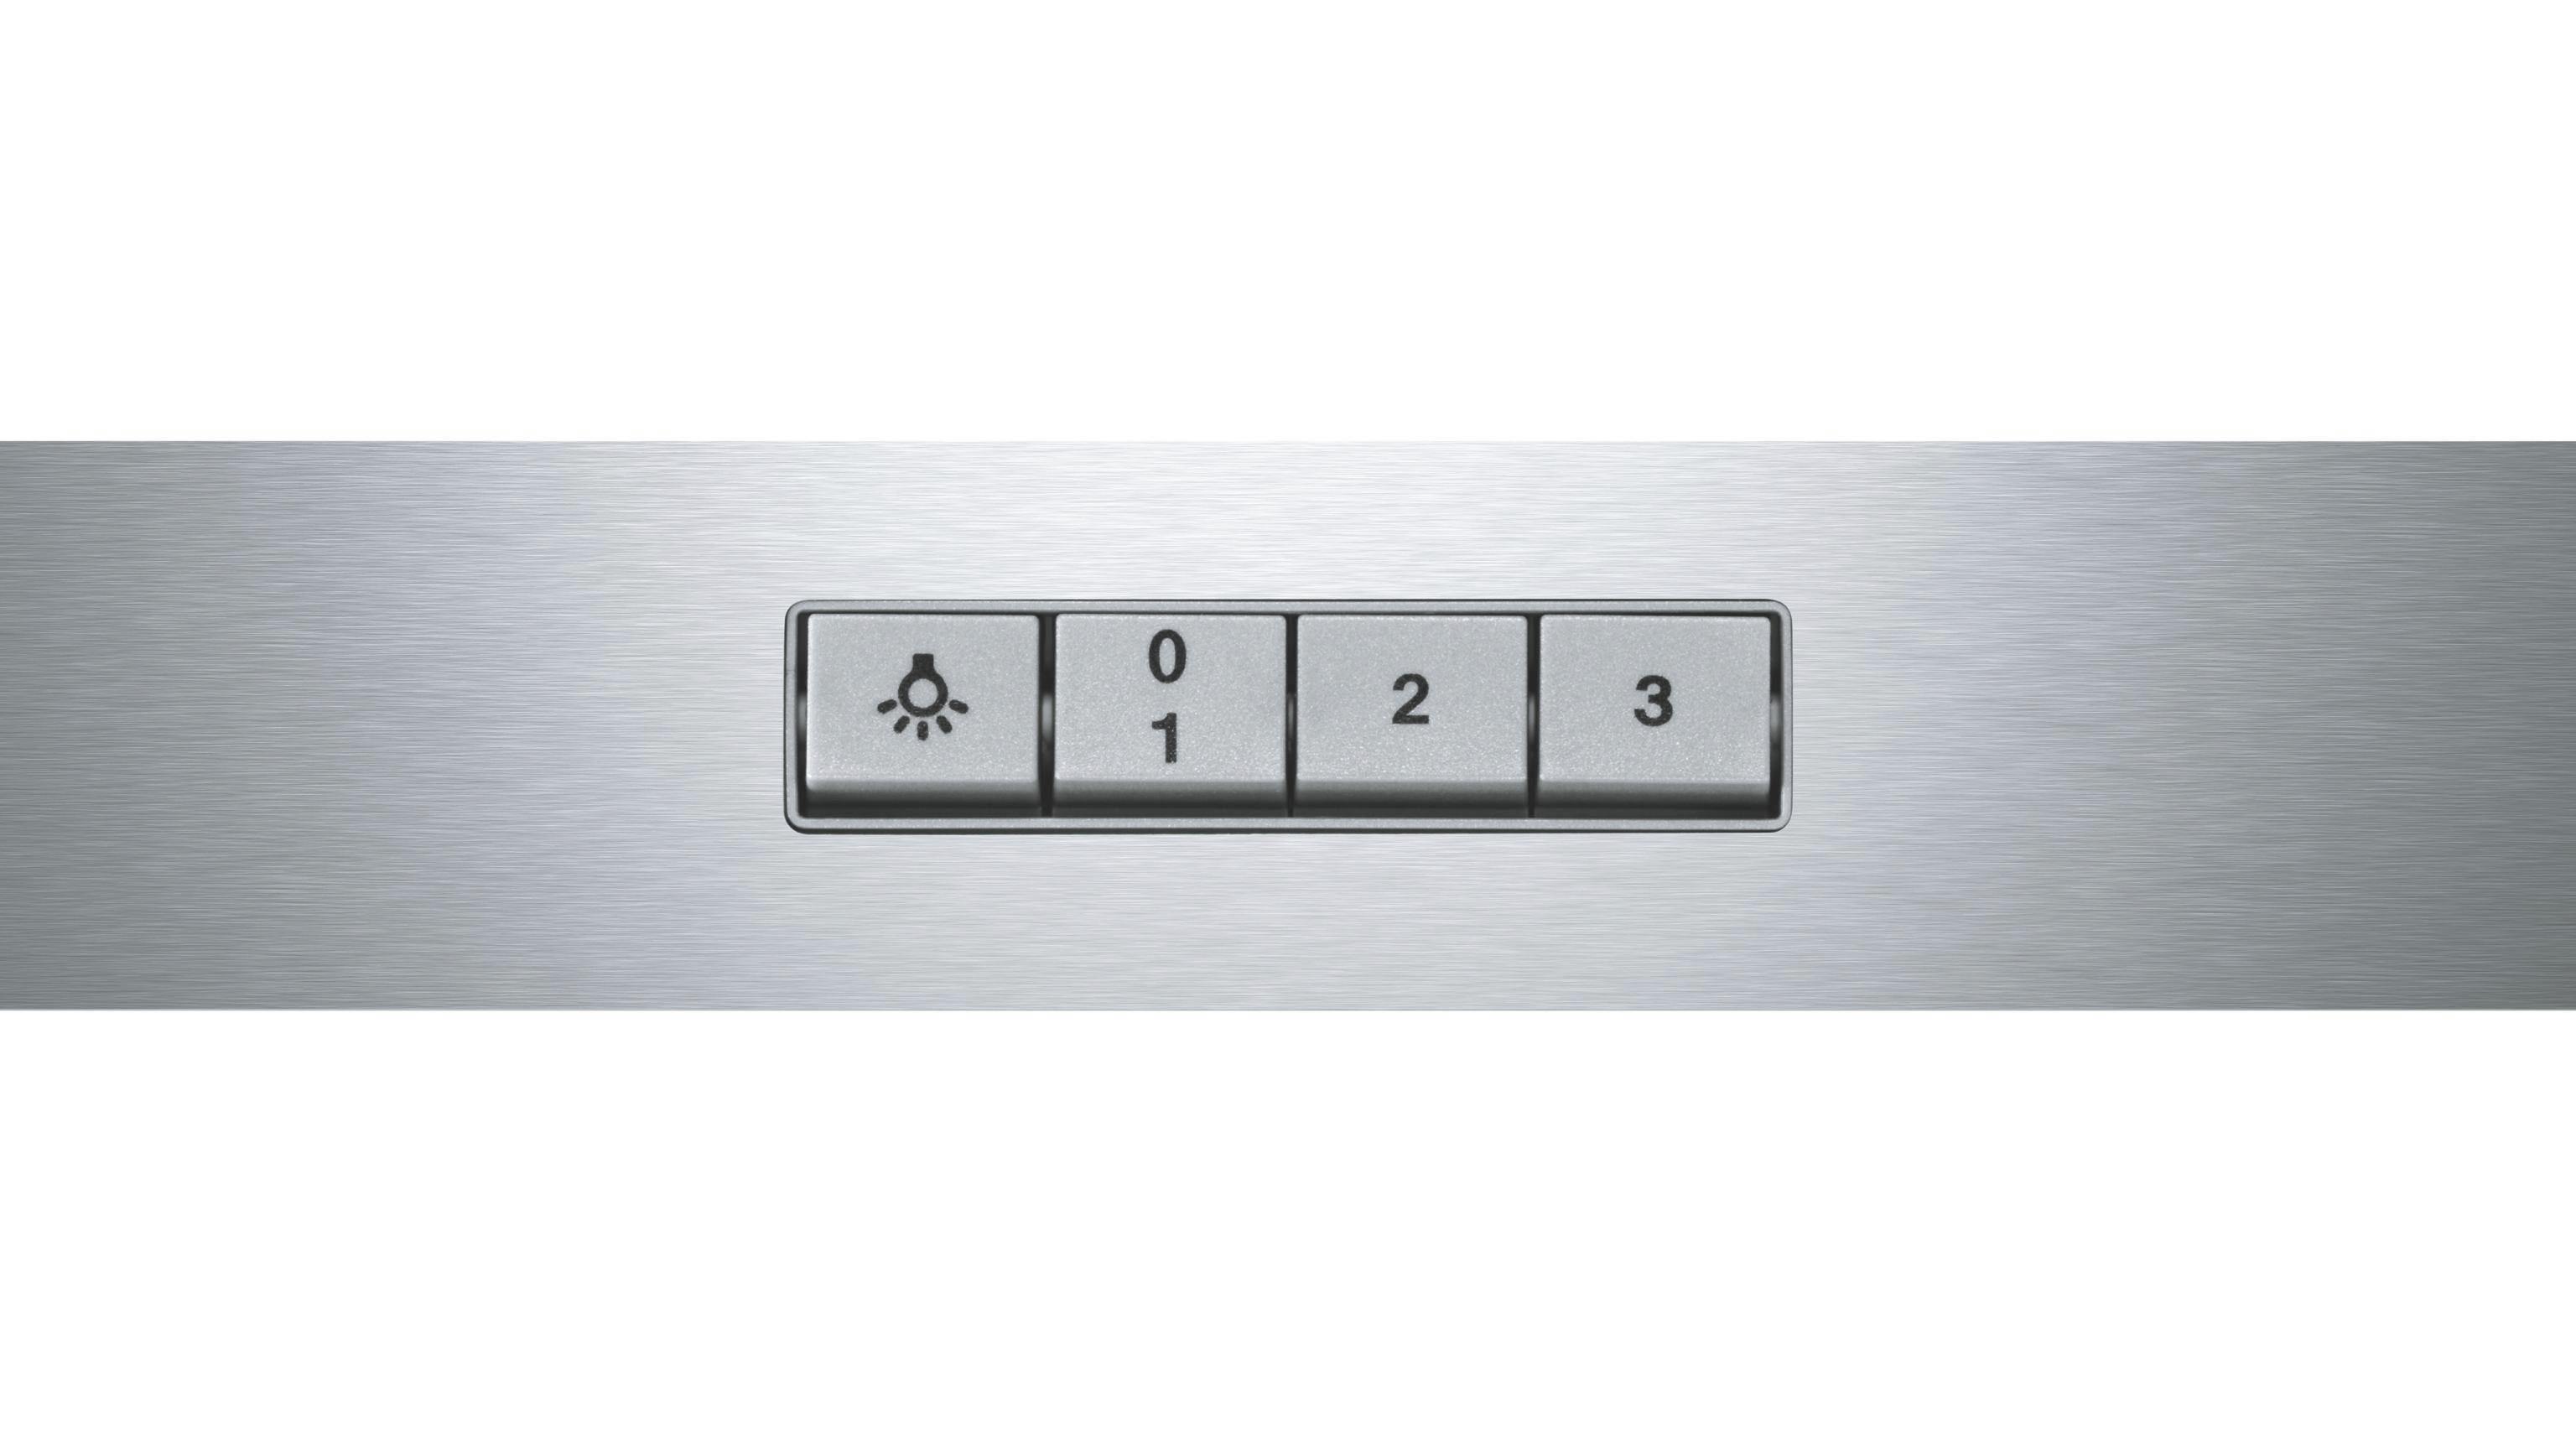 Dunstabzugshaube Bosch Dwa064w50, EEZ D - ROMANTIK / LANDHAUS, Glas/Metall (60/63,4-106,4/54cm) - BOSCH